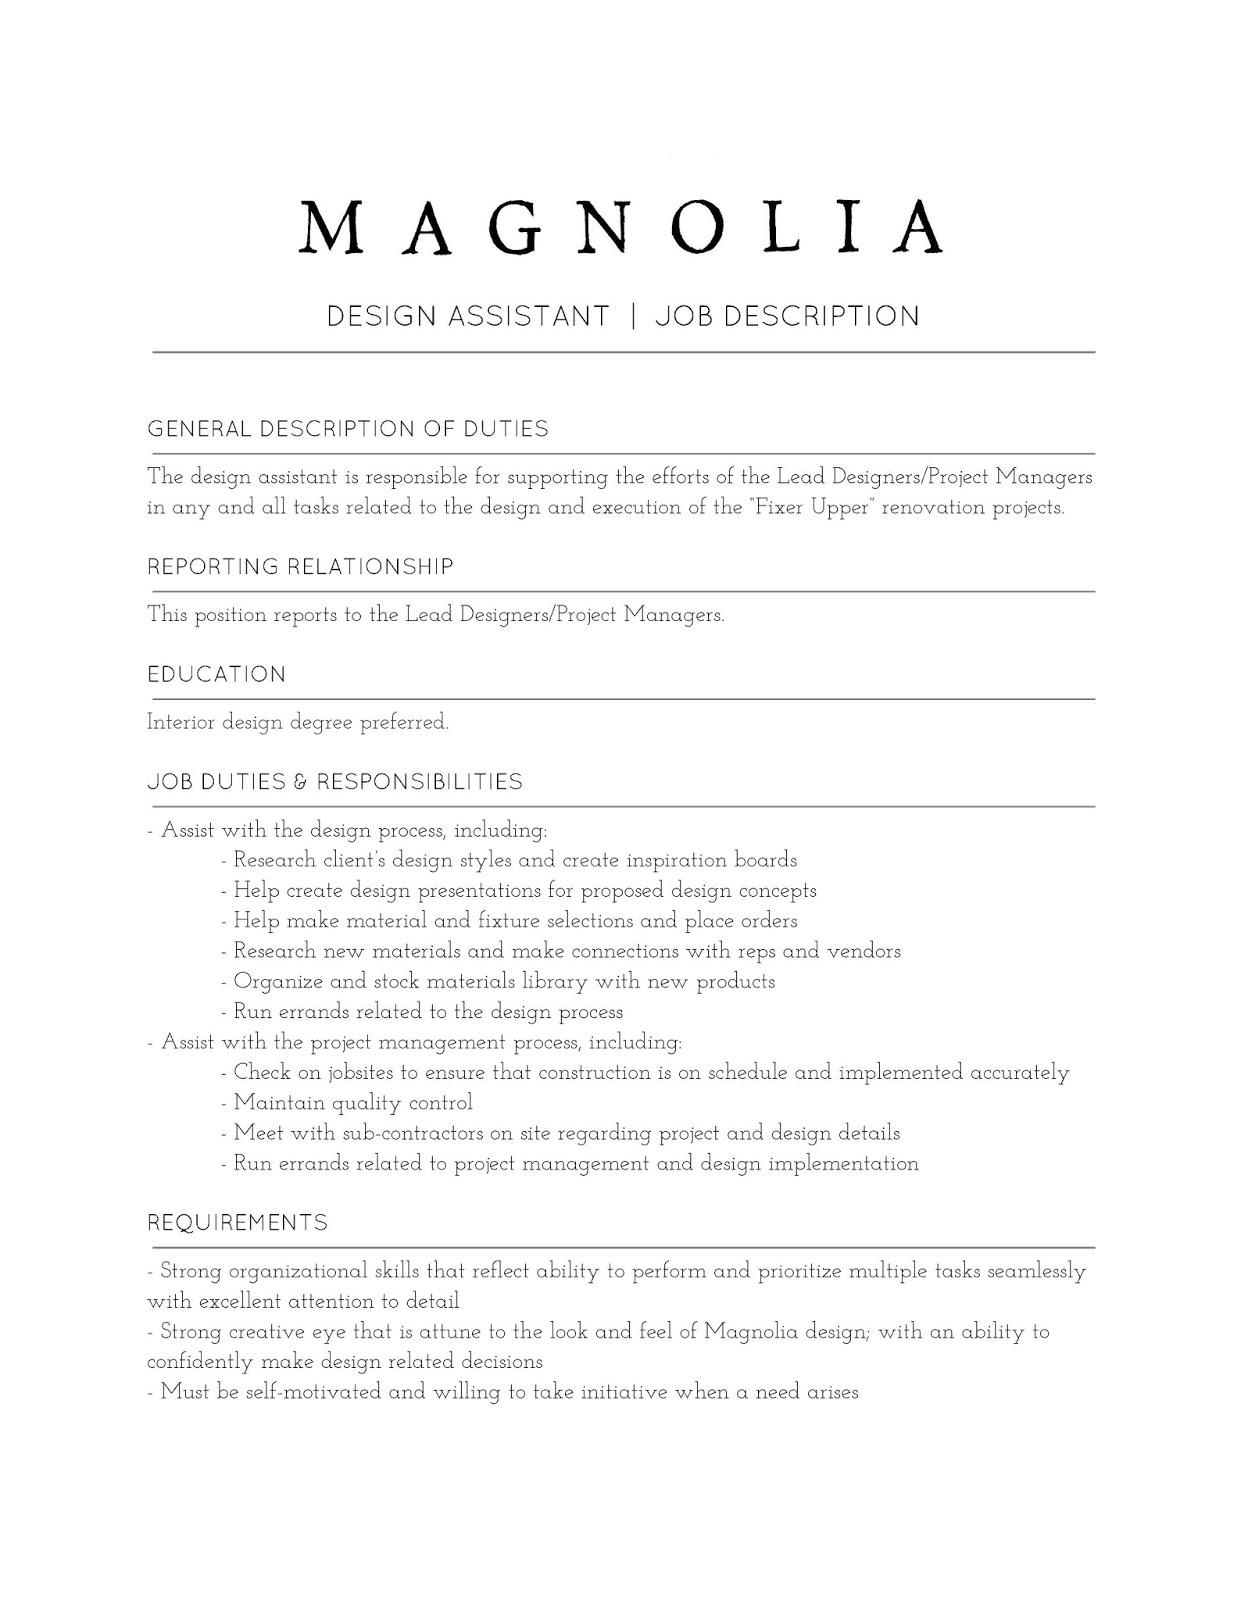 Interior Design Blog Design Assistant Position at Magnolia